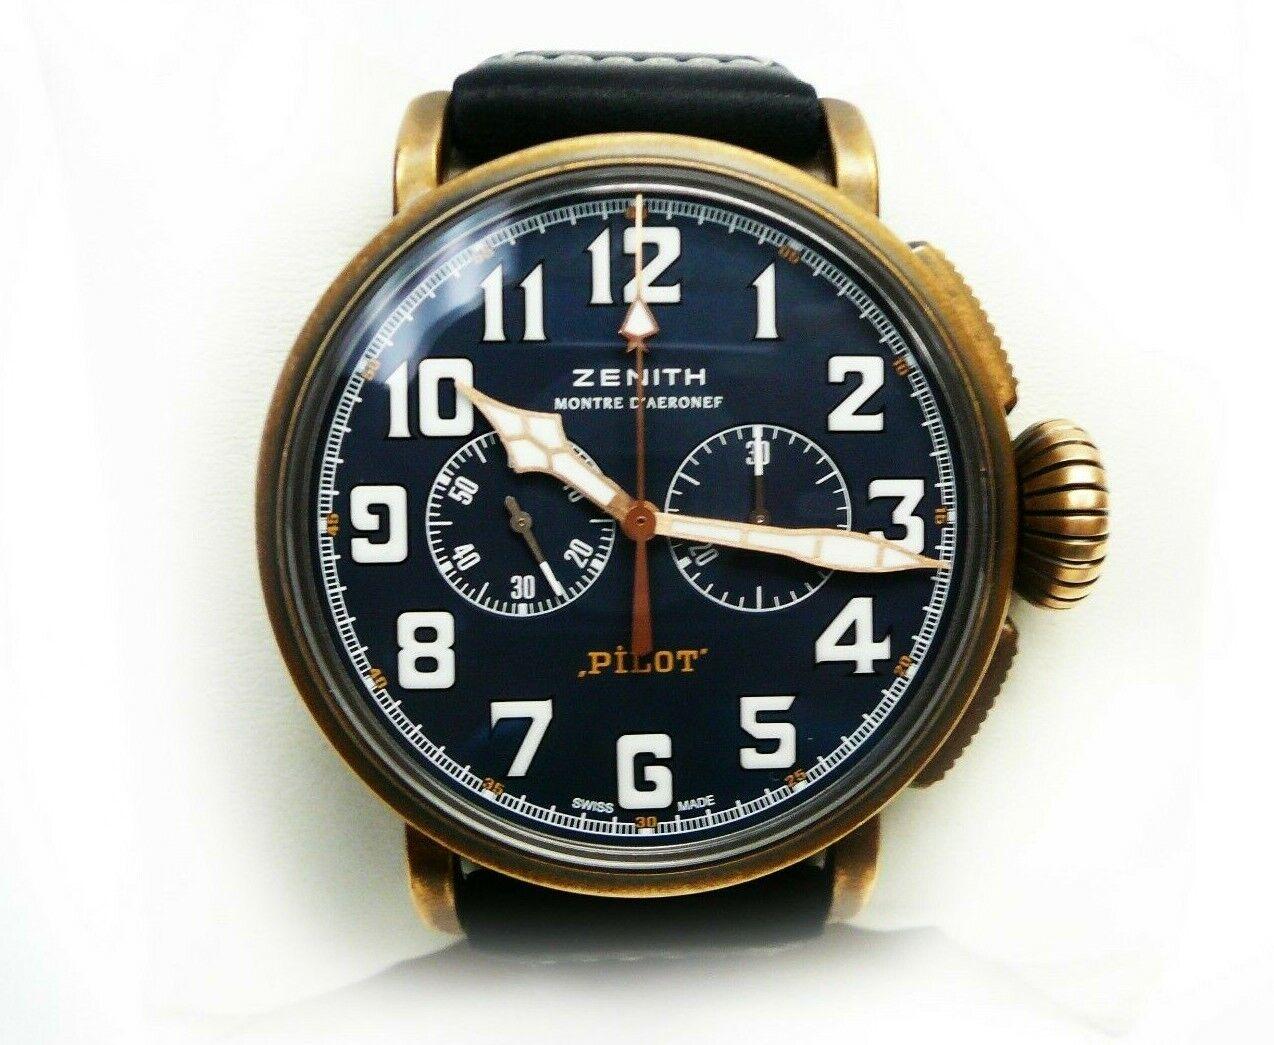 Zenith Pilot Type 20 Extra Special El Primero Bronze Case Blue Dial 29.2430.4069 - watch picture 1